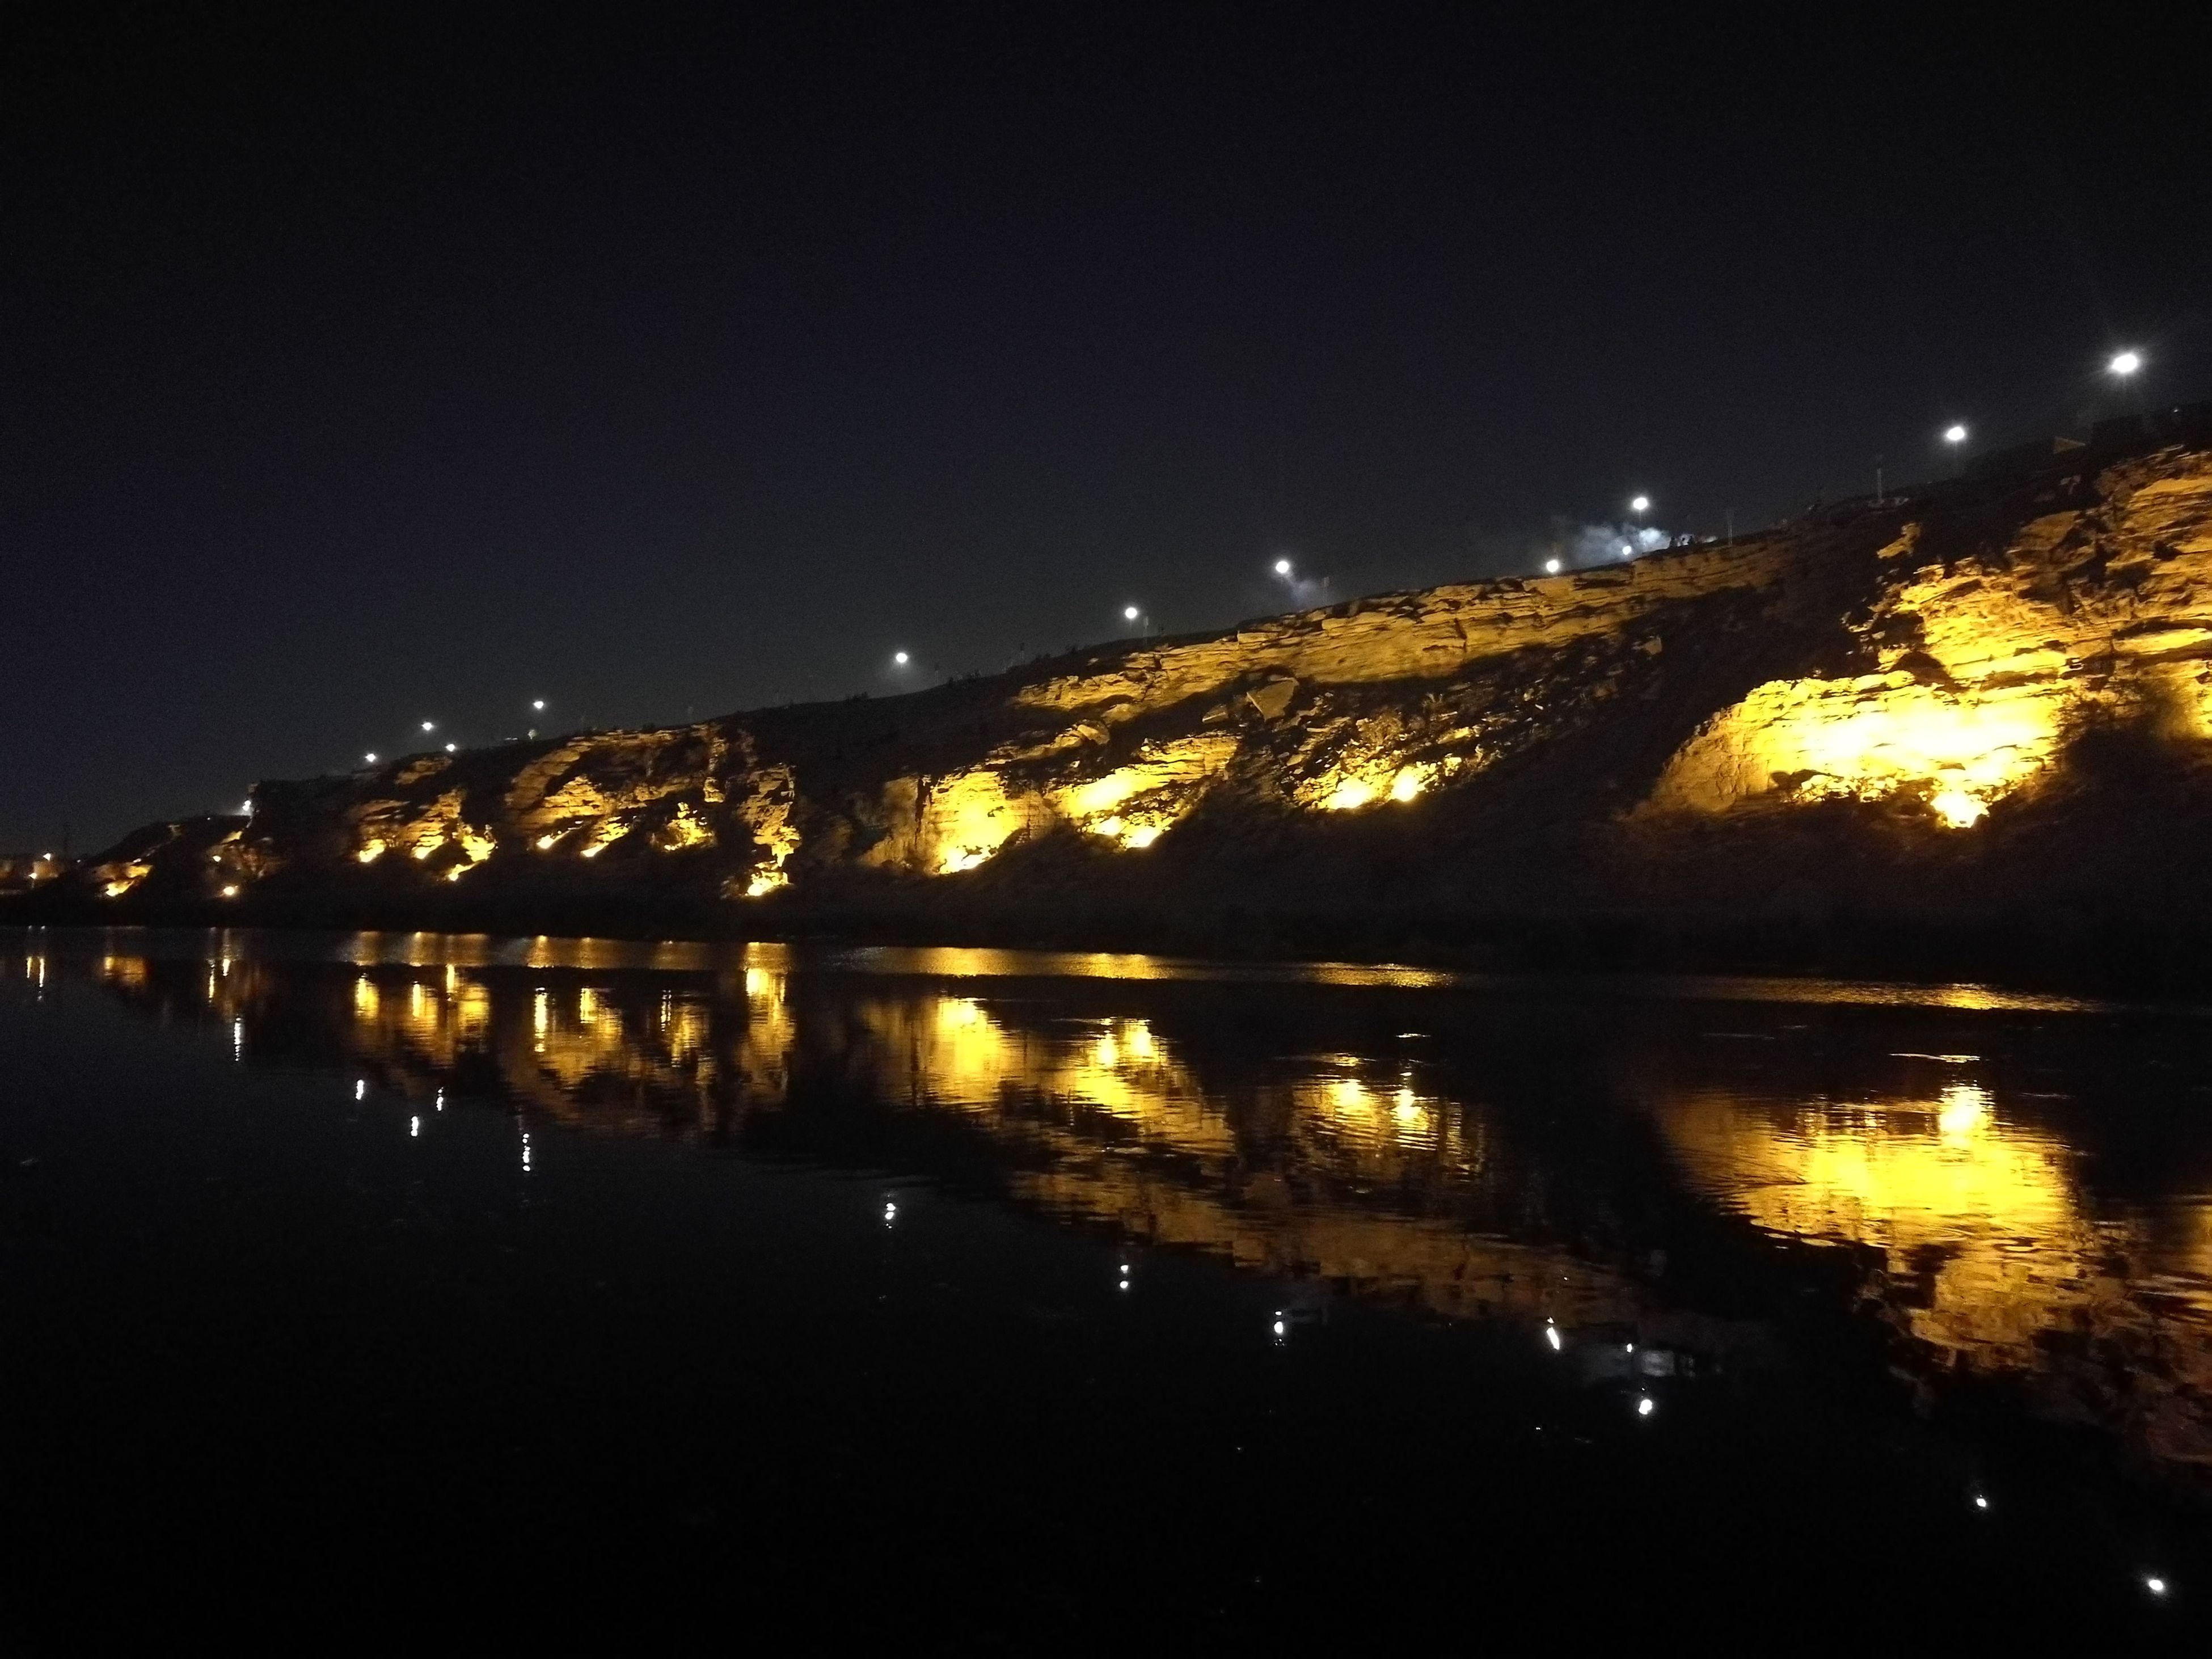 Namar Dam Riyadh City Night Reflection Water Sky Nature Illuminated Outdoors No People